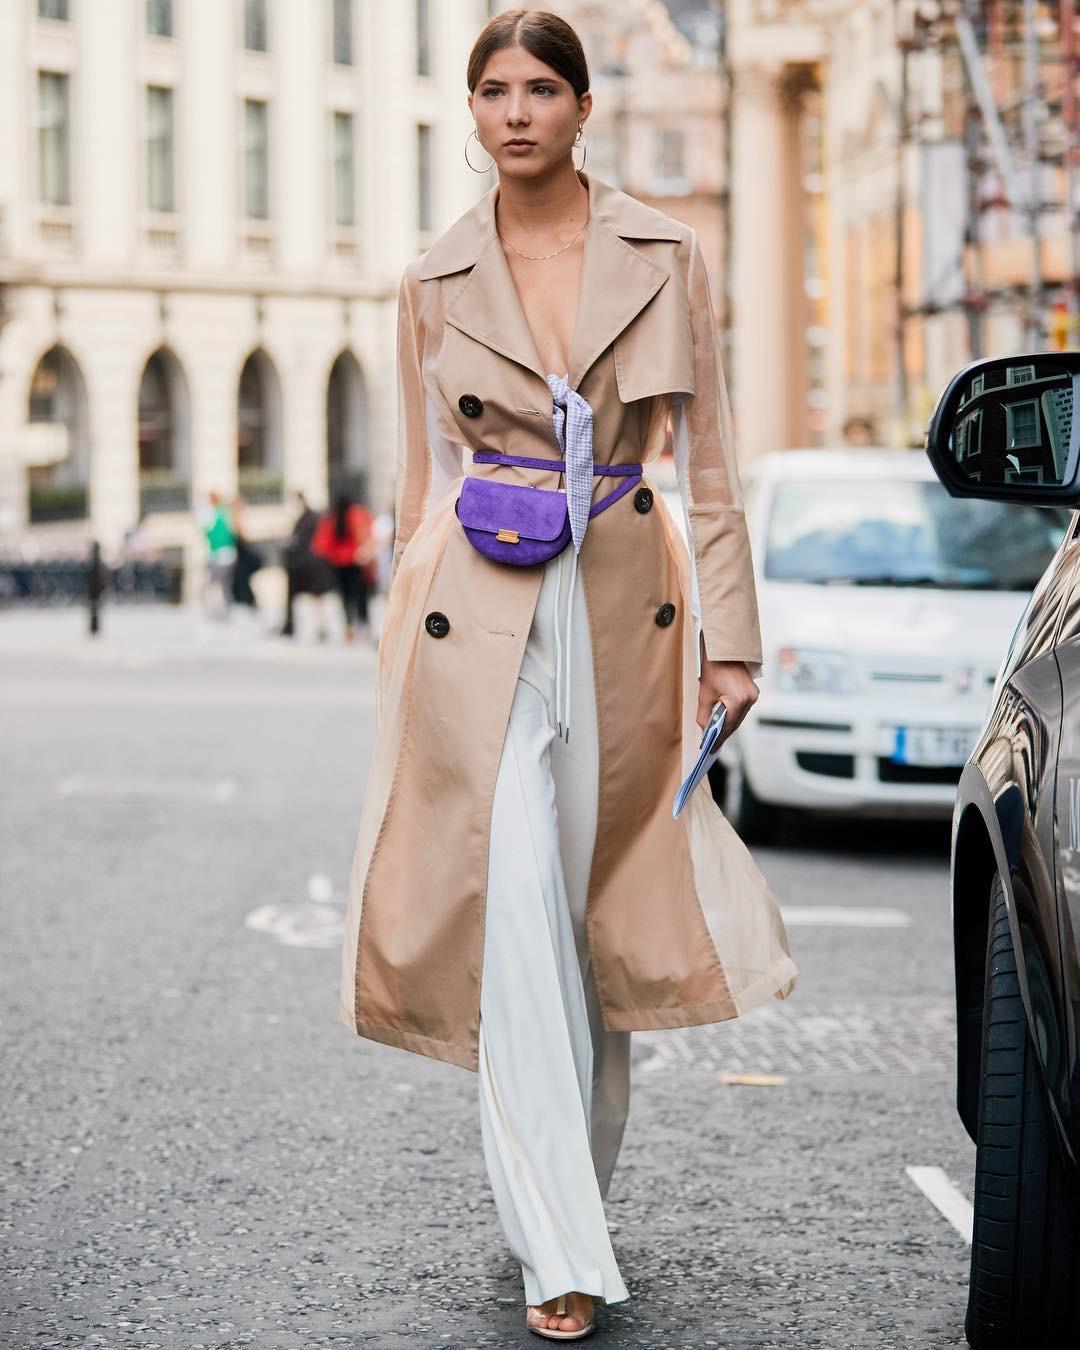 elle việt nam trang phục tím lavender 31